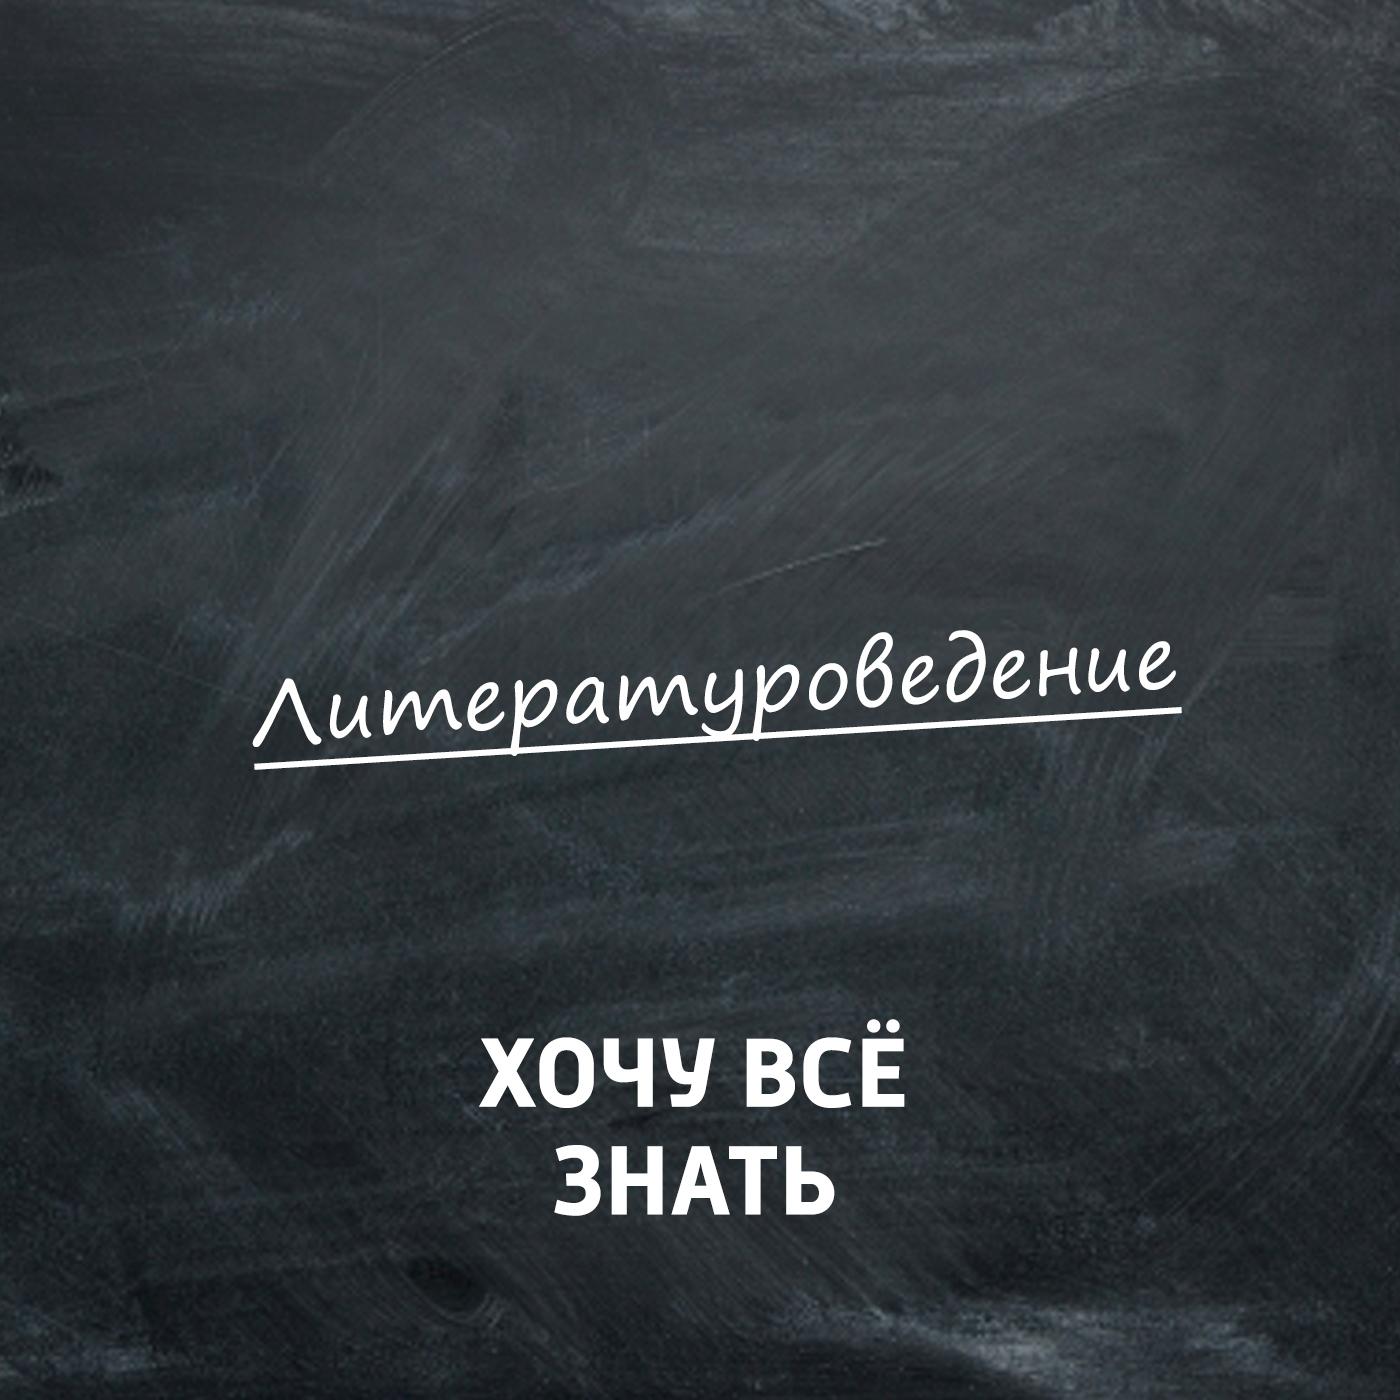 "Сказка об отношениях. А.С.Пушкин «О царе Салтане\"""